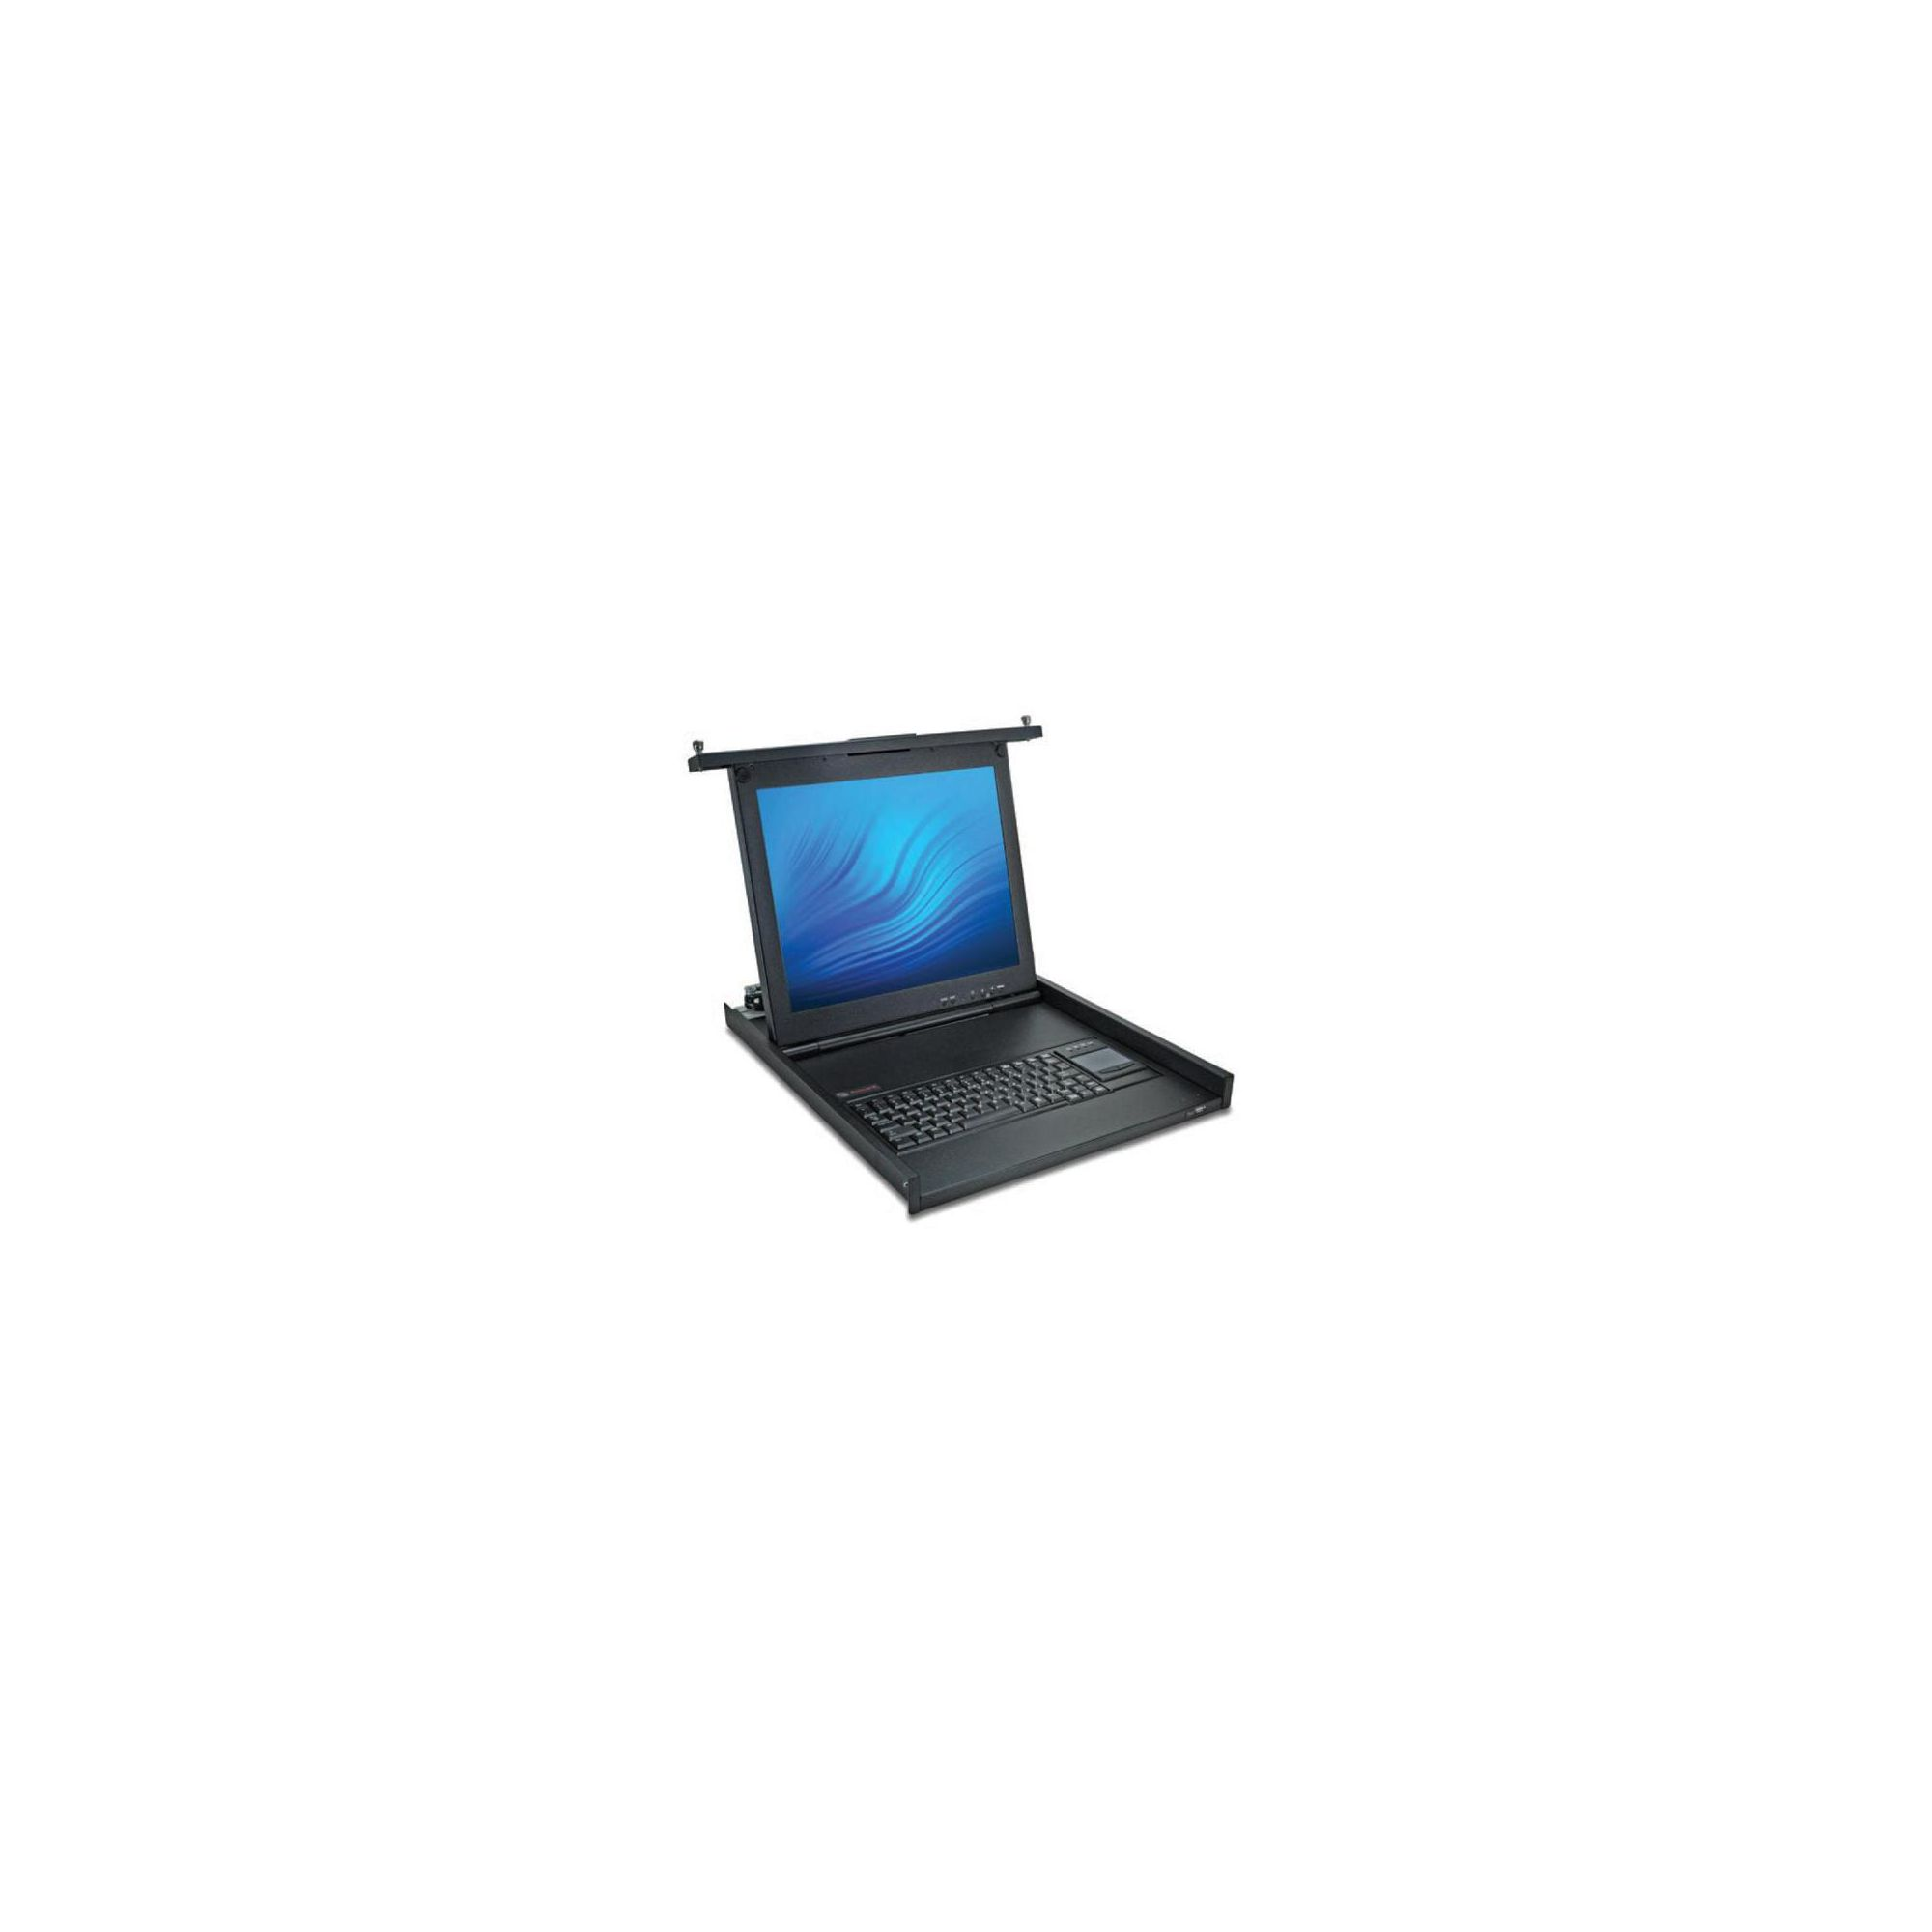 Computing Peripherals at Tesco Direct